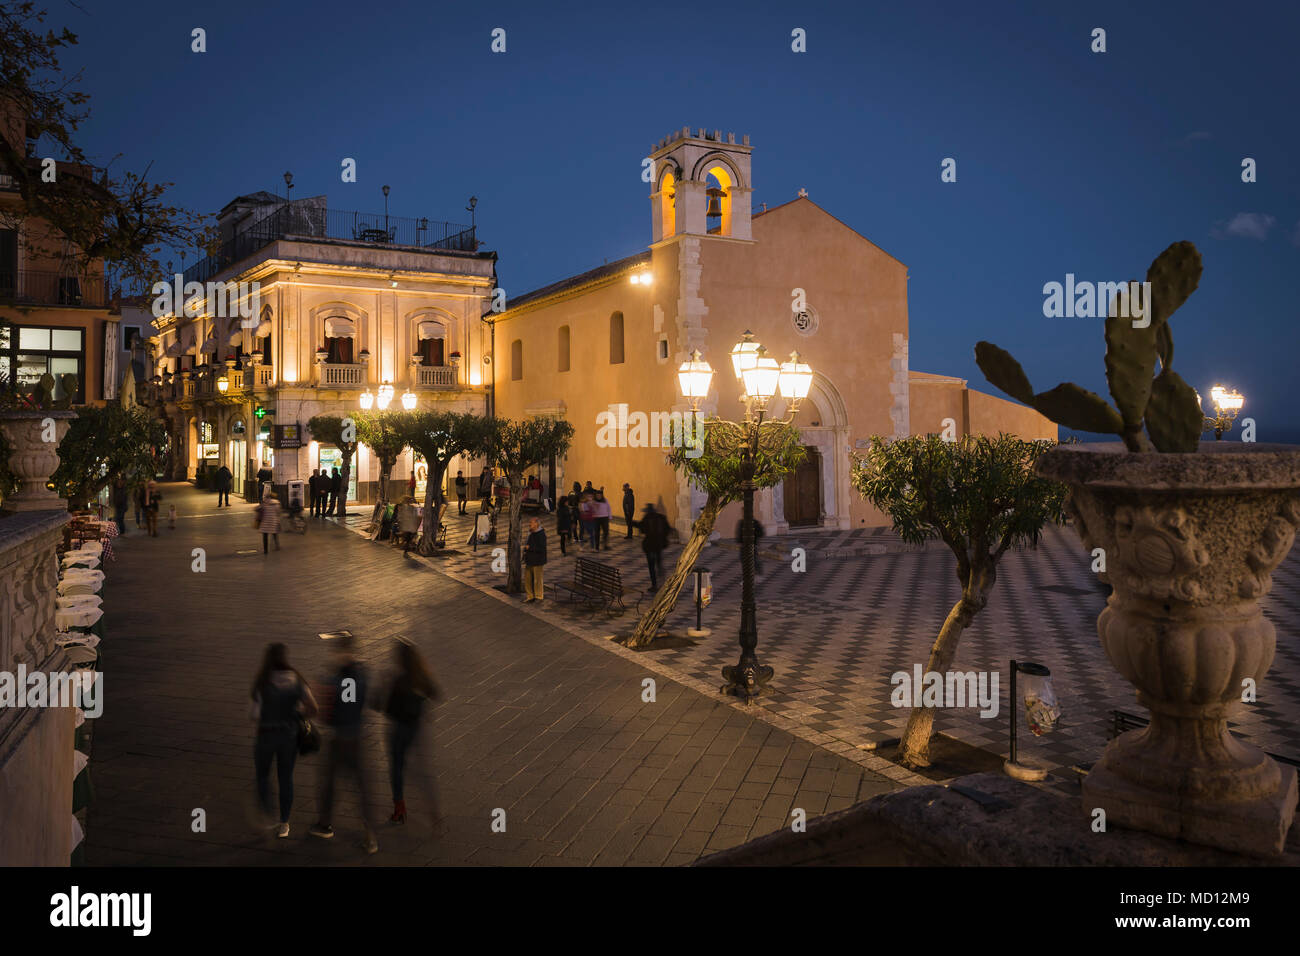 Piazza IX Apeile Square und Corso Umberto in Taormina, Sizilien. Stockbild